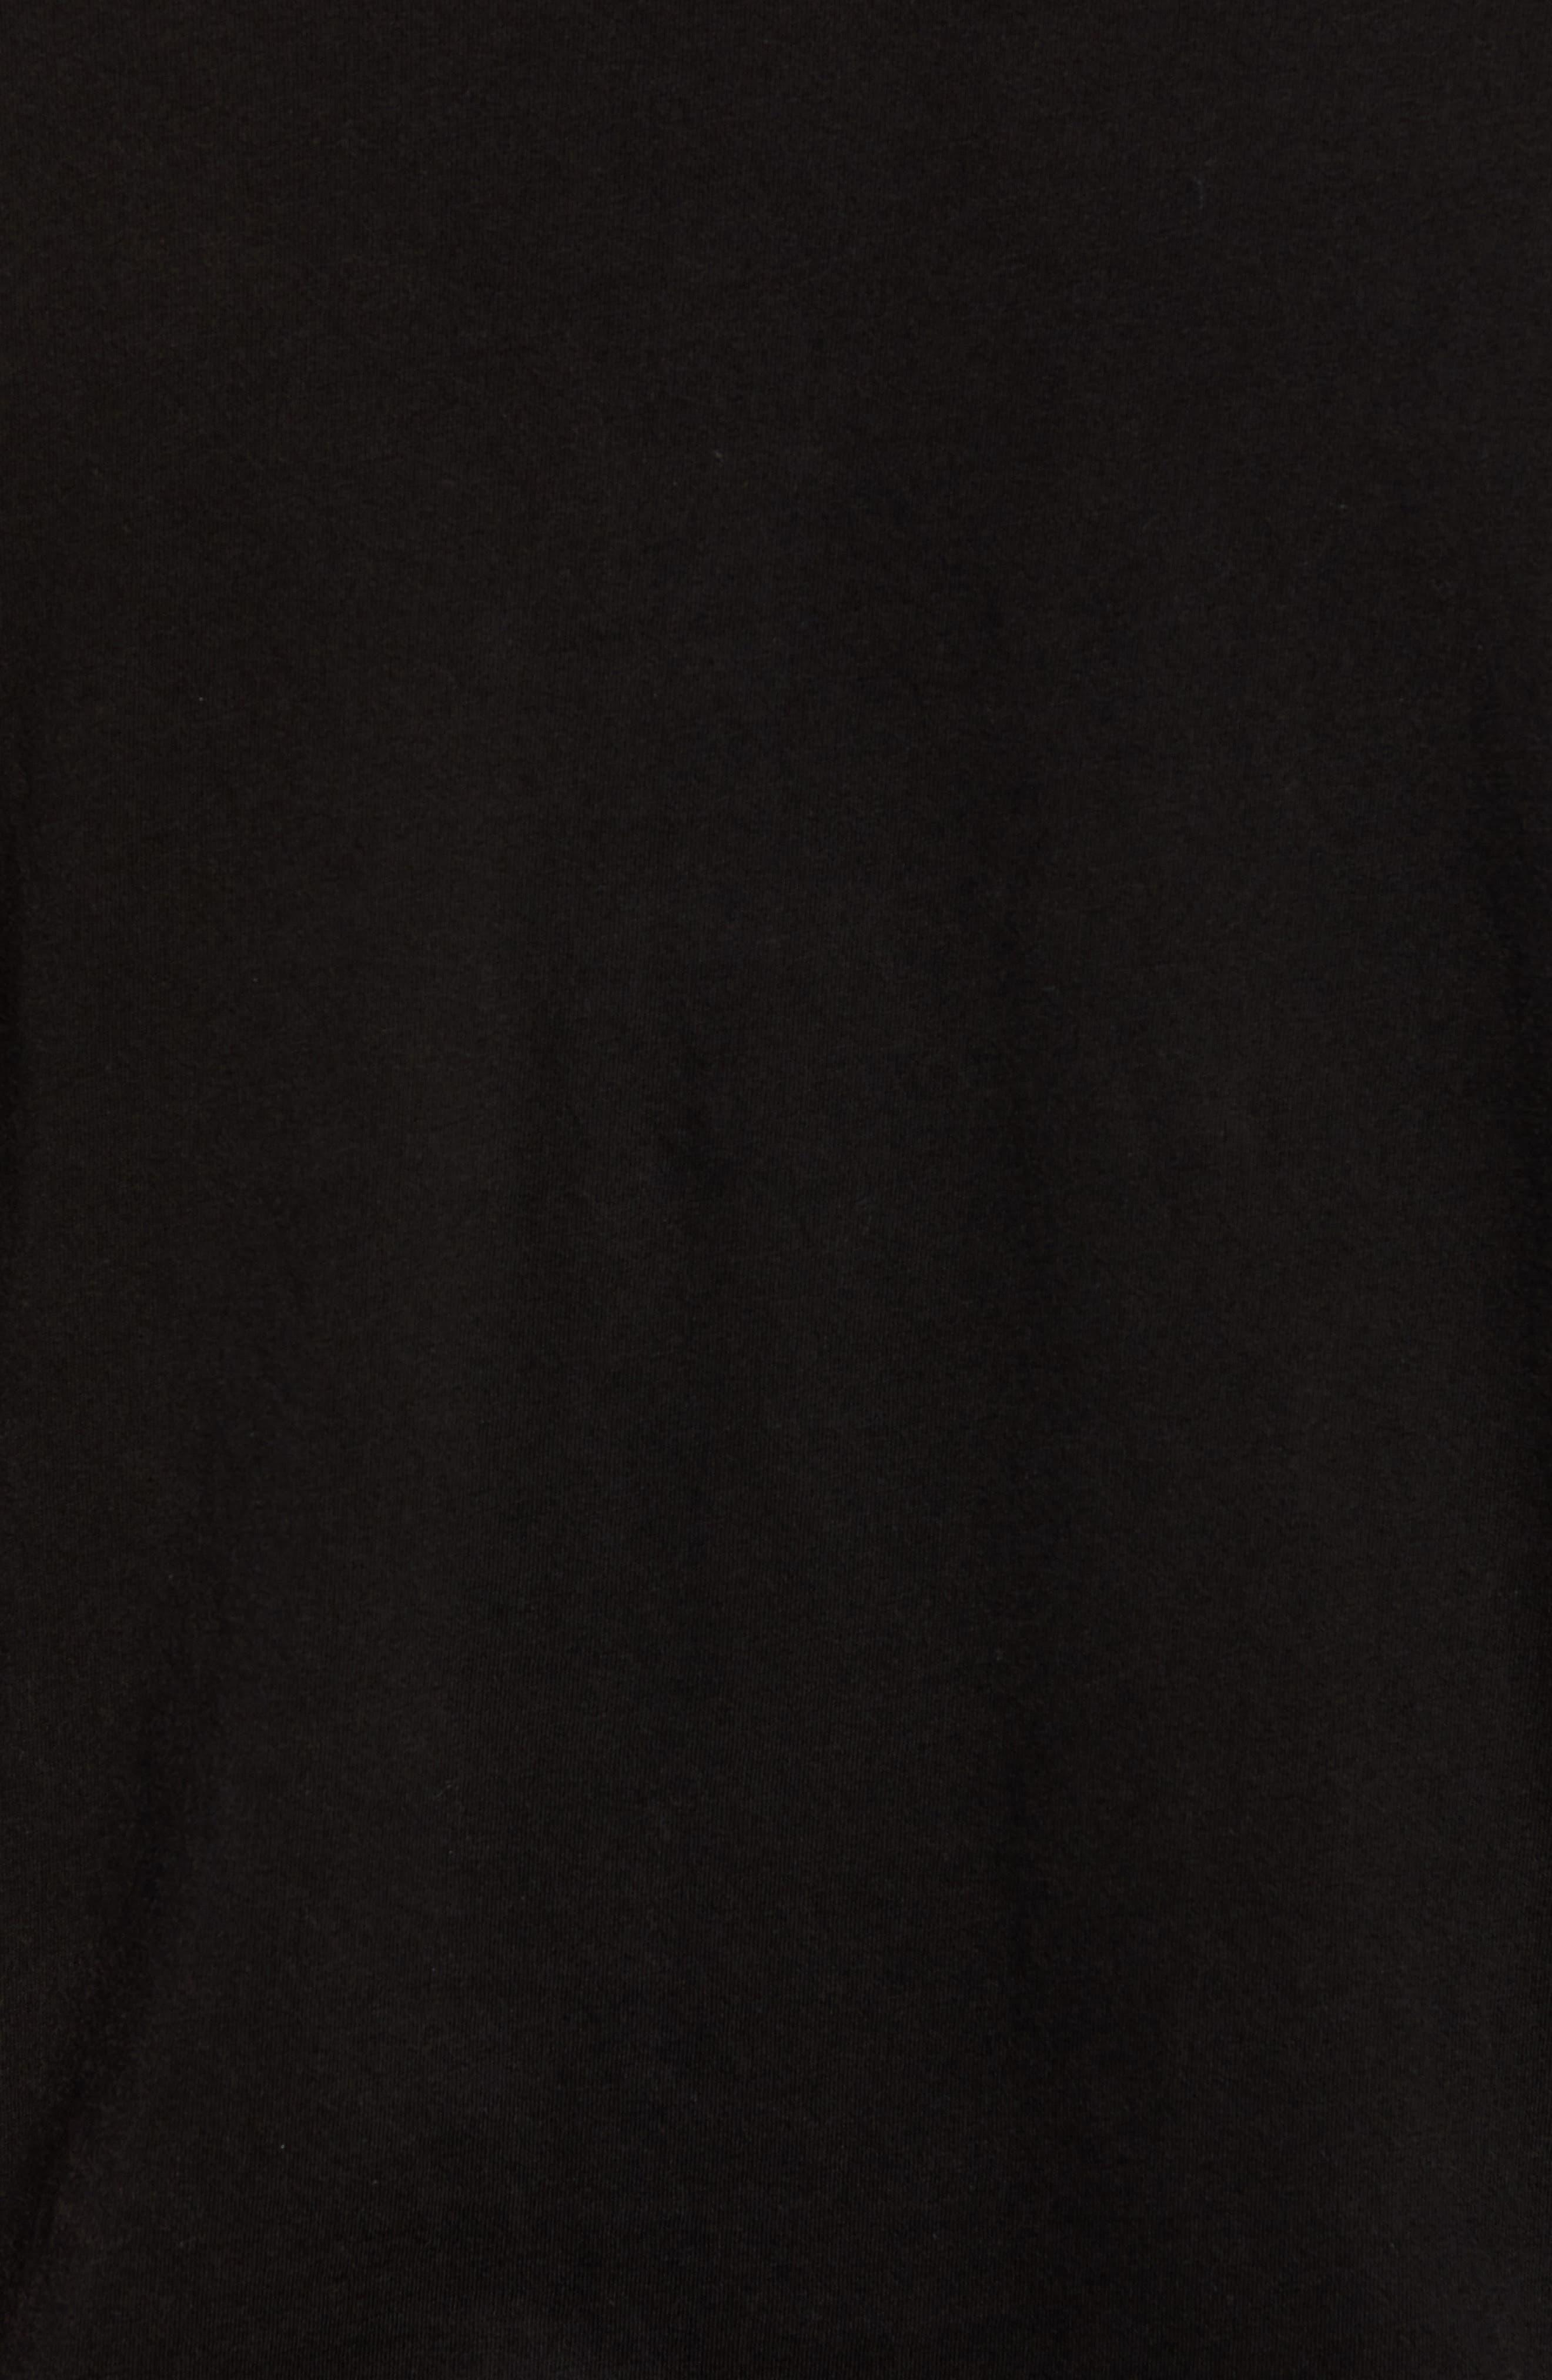 Skullhawks Graphic T-Shirt,                             Alternate thumbnail 5, color,                             BLACK